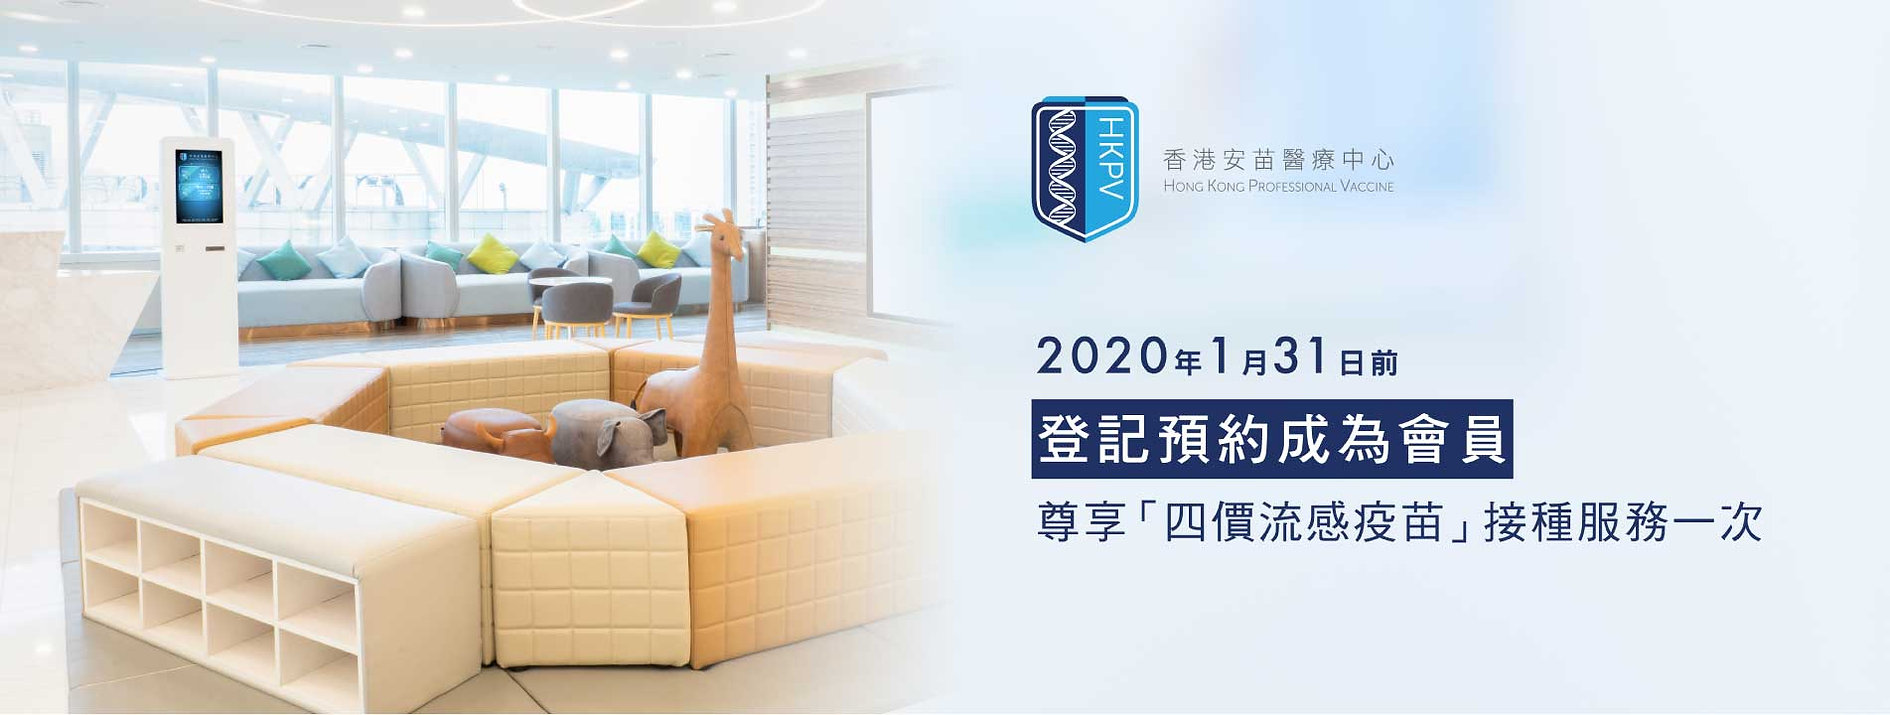 HKPV_Online-Ad-Banner_202000110-01.jpg